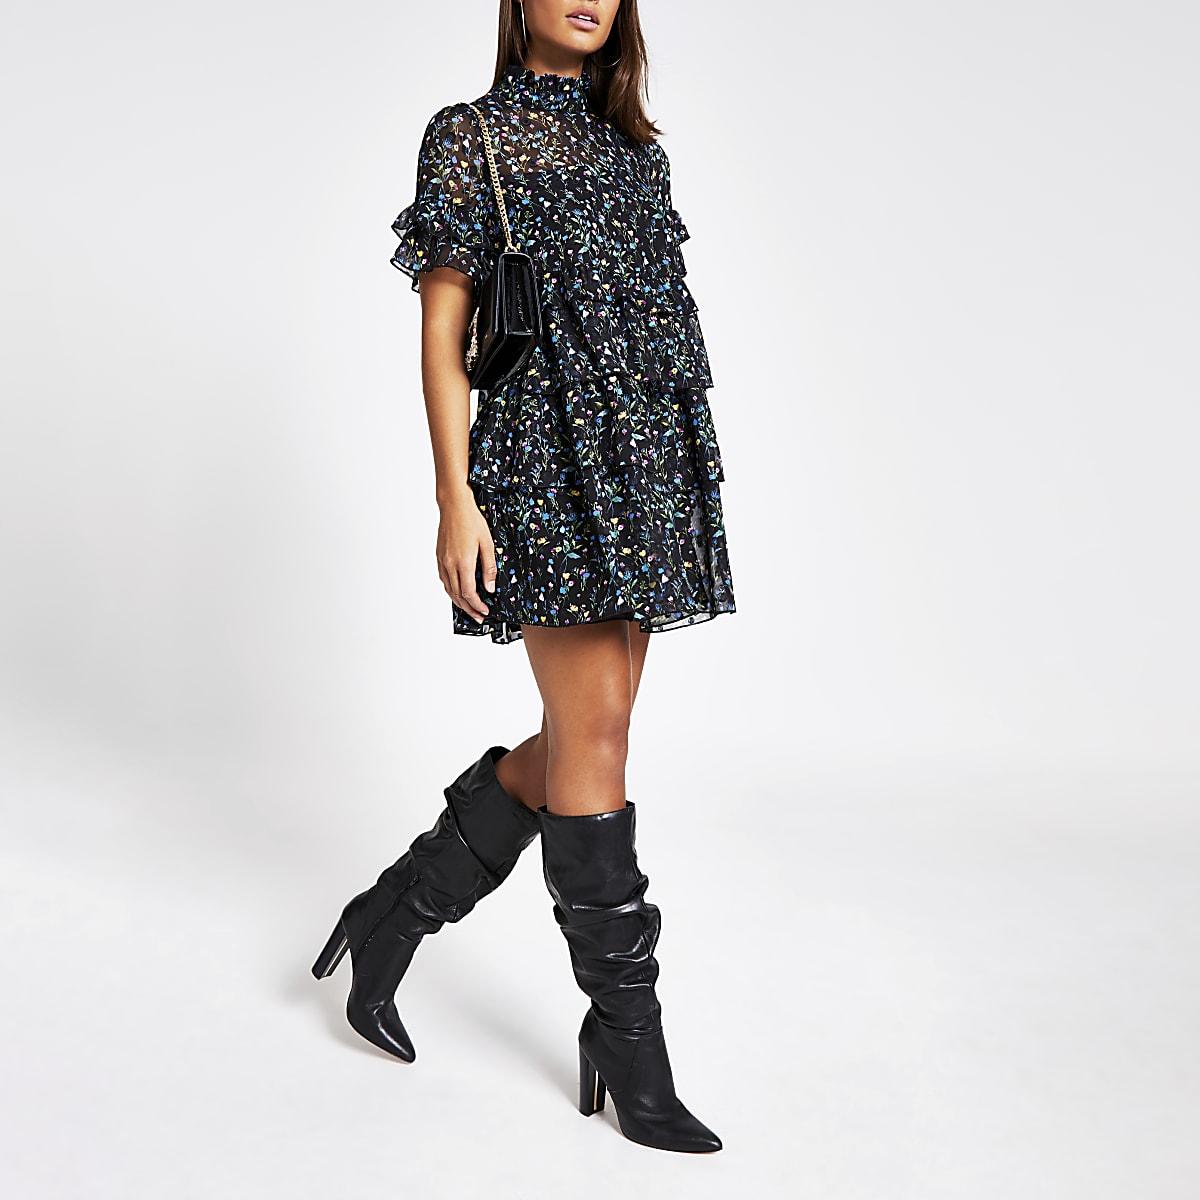 Black floral ruffle swing dress